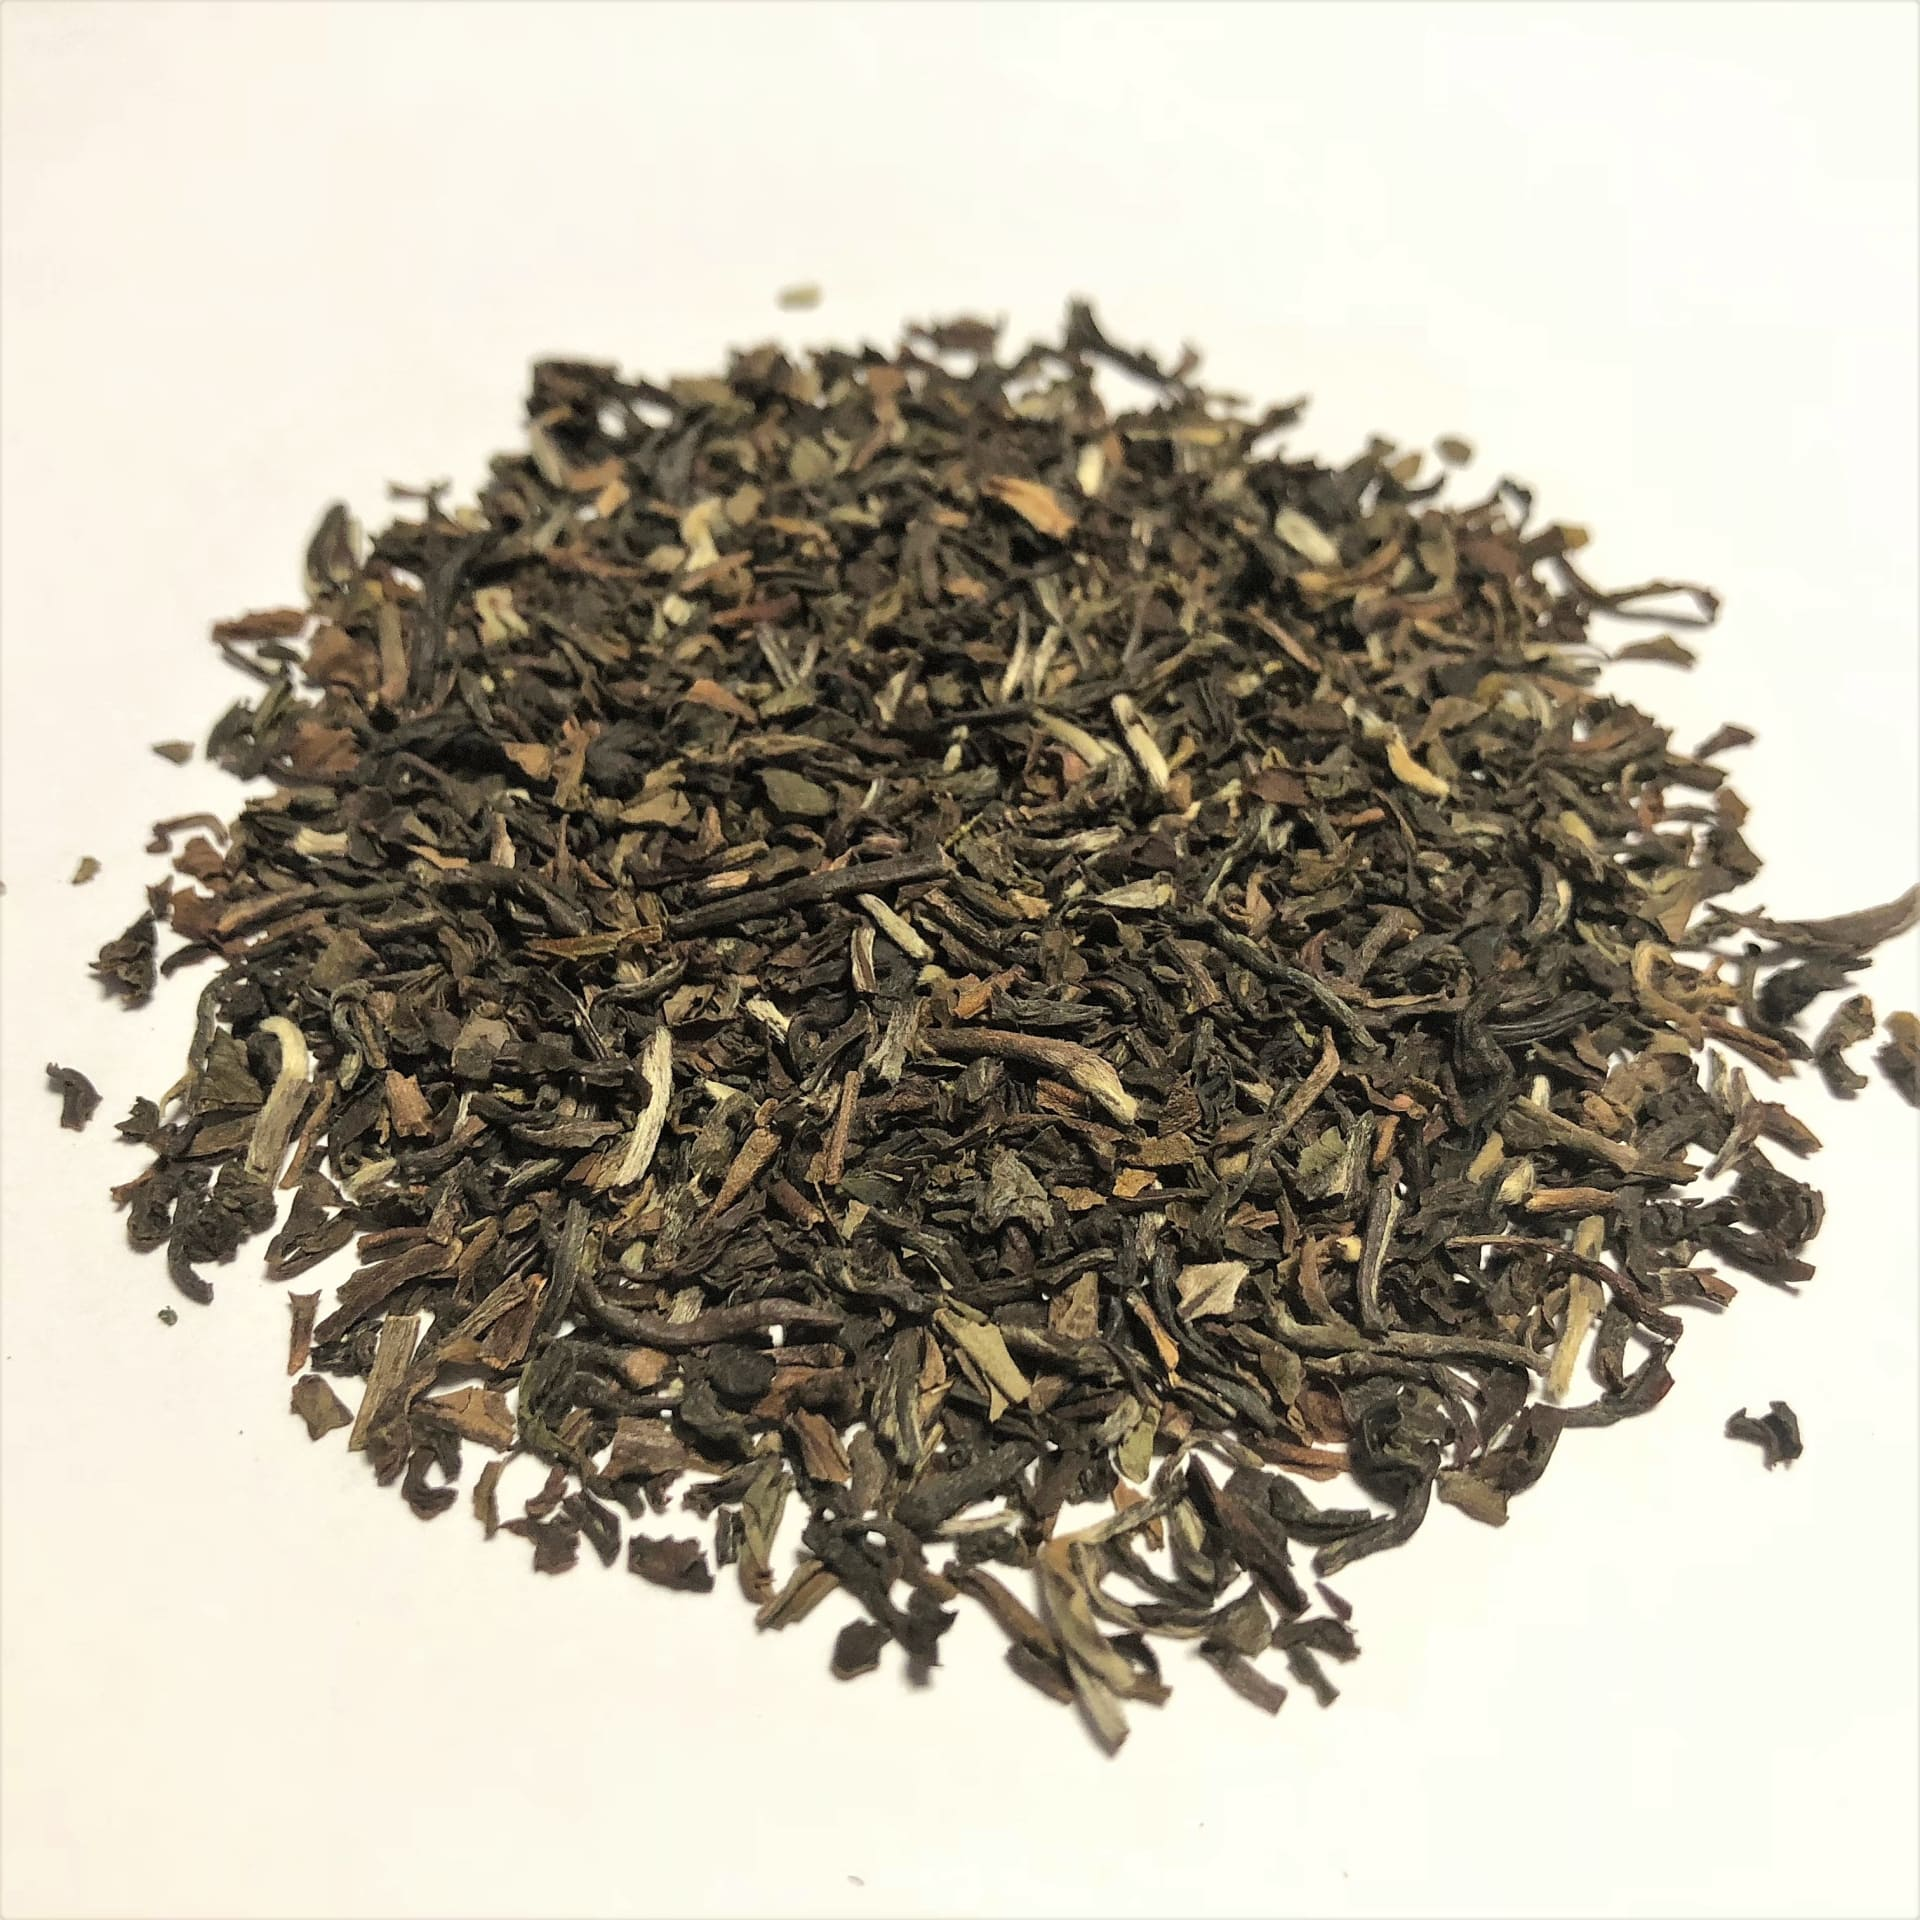 1st Flush Darjeeling - FTGFOP - 1 - Loose Leaf Tea